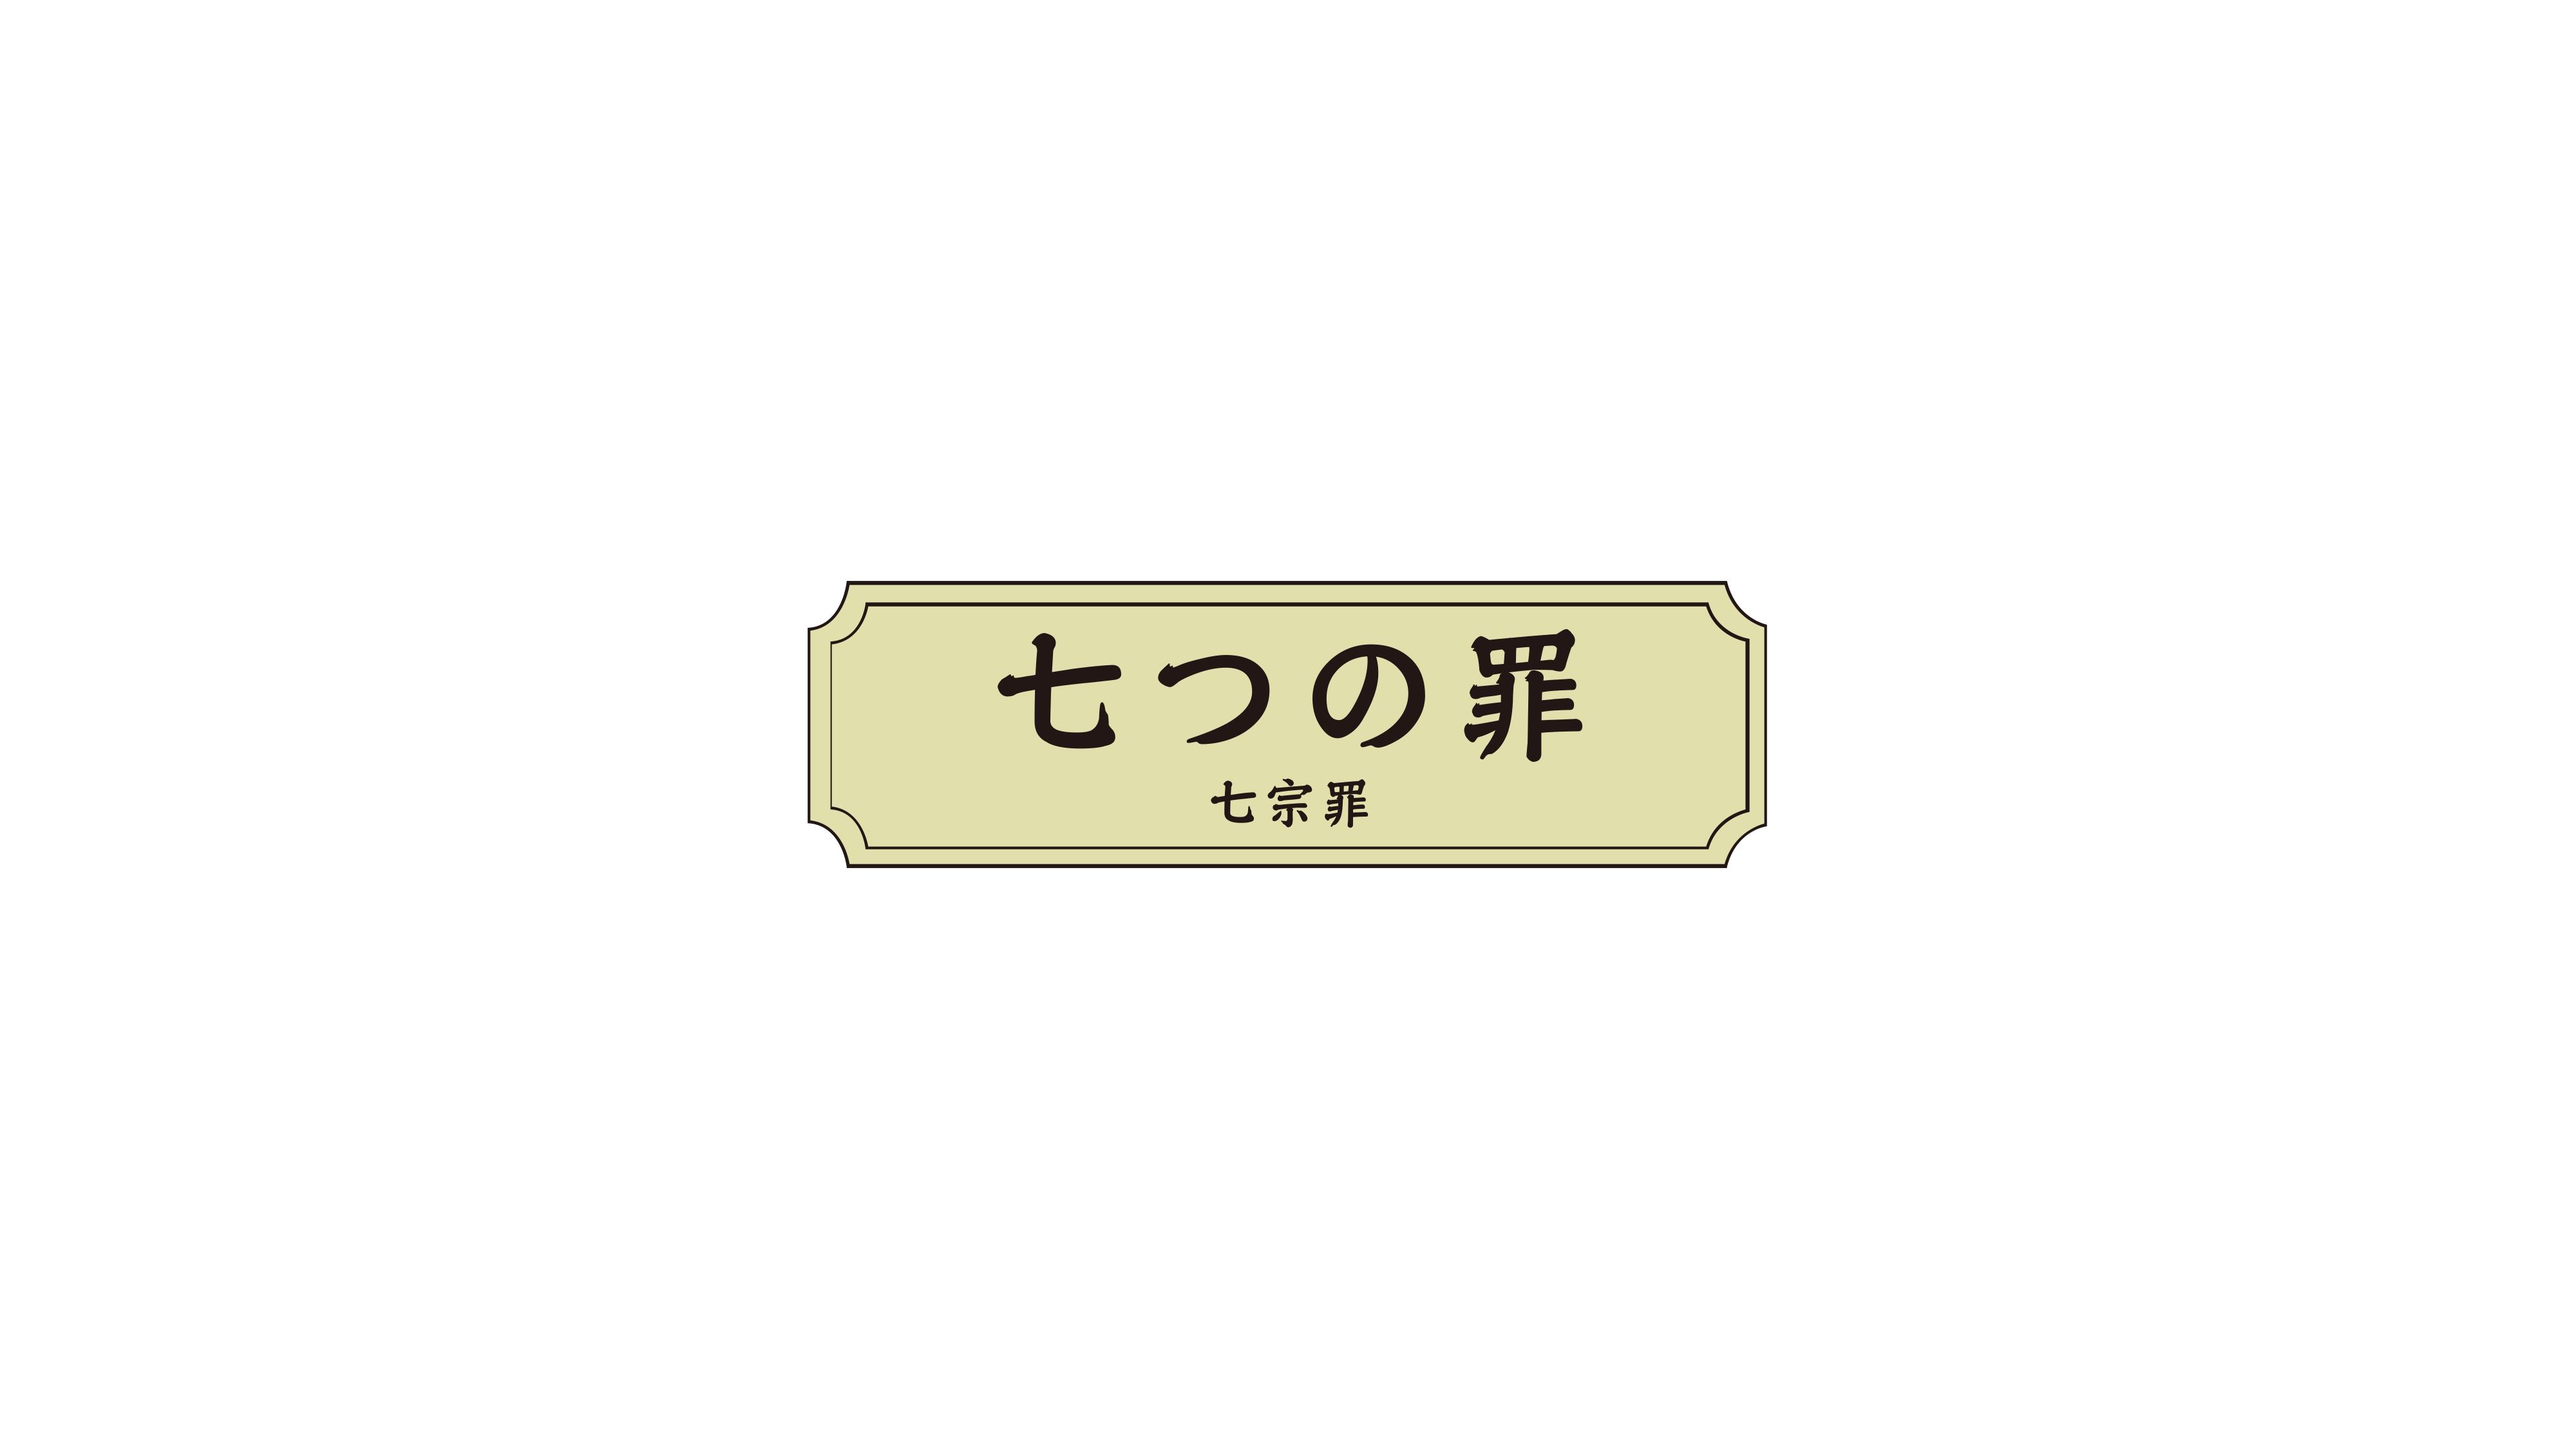 七宗罪_pages-to-jpg-0001